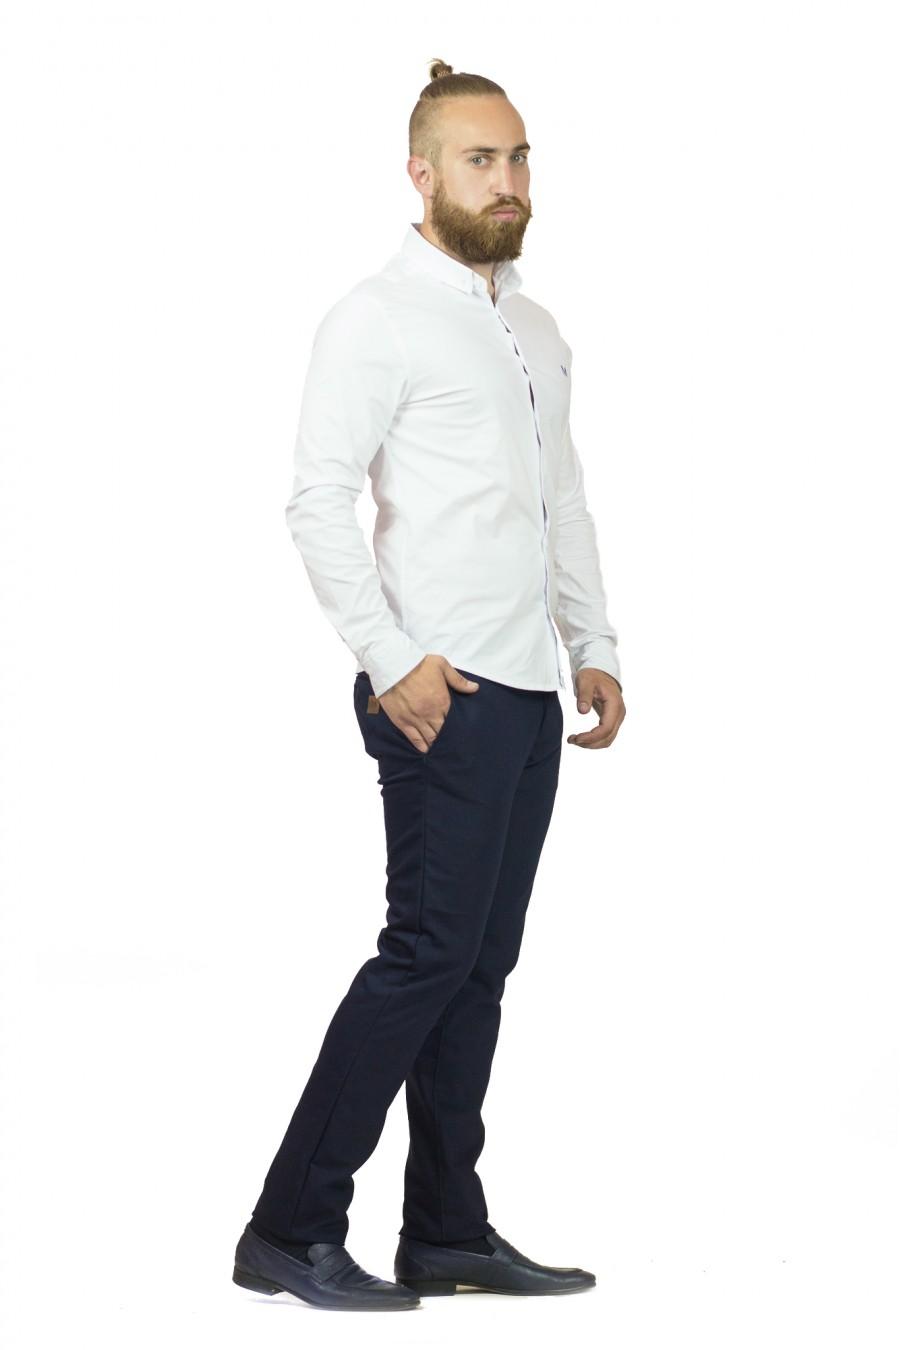 Мужская рубашка S-119-1